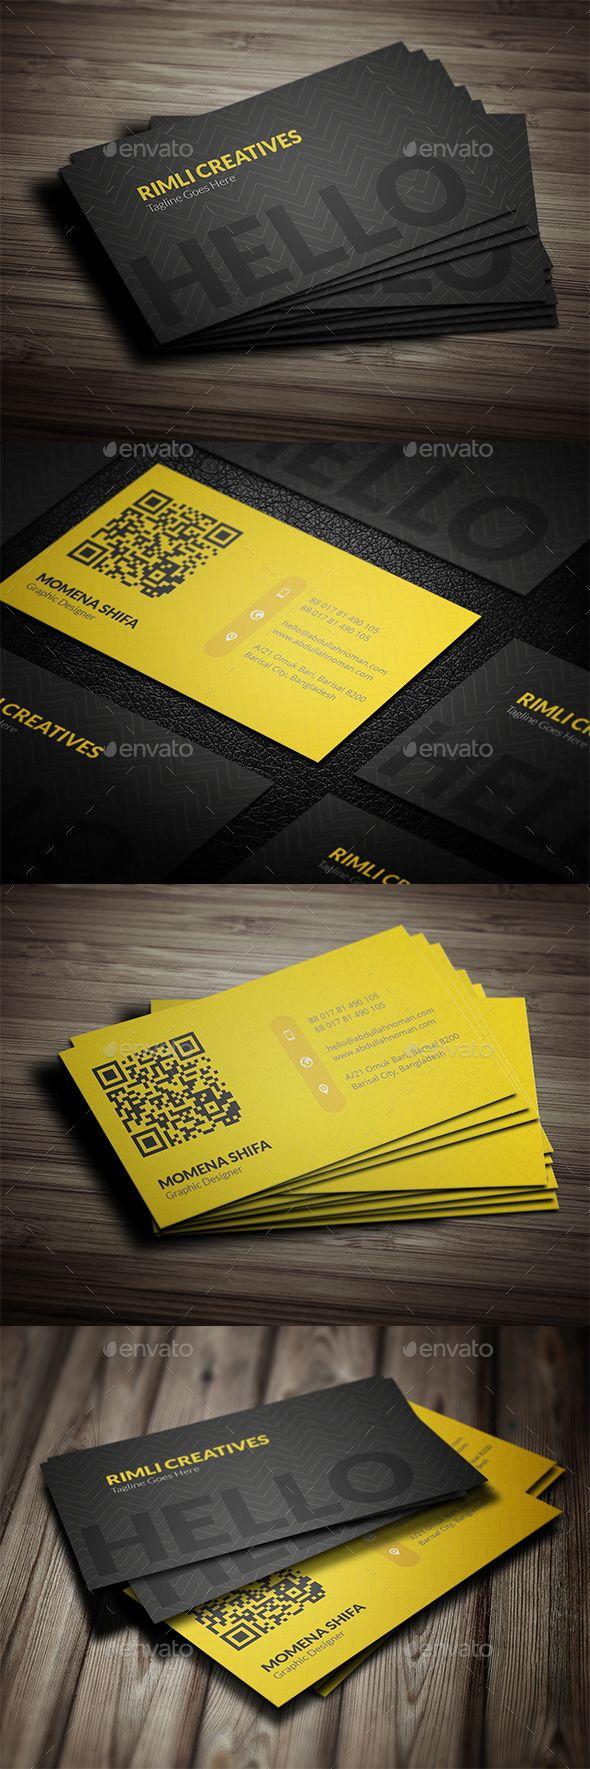 Fancy diy business cards free ideas business card ideas etadamfo creative homemade business cards image collections card design and solutioingenieria Choice Image